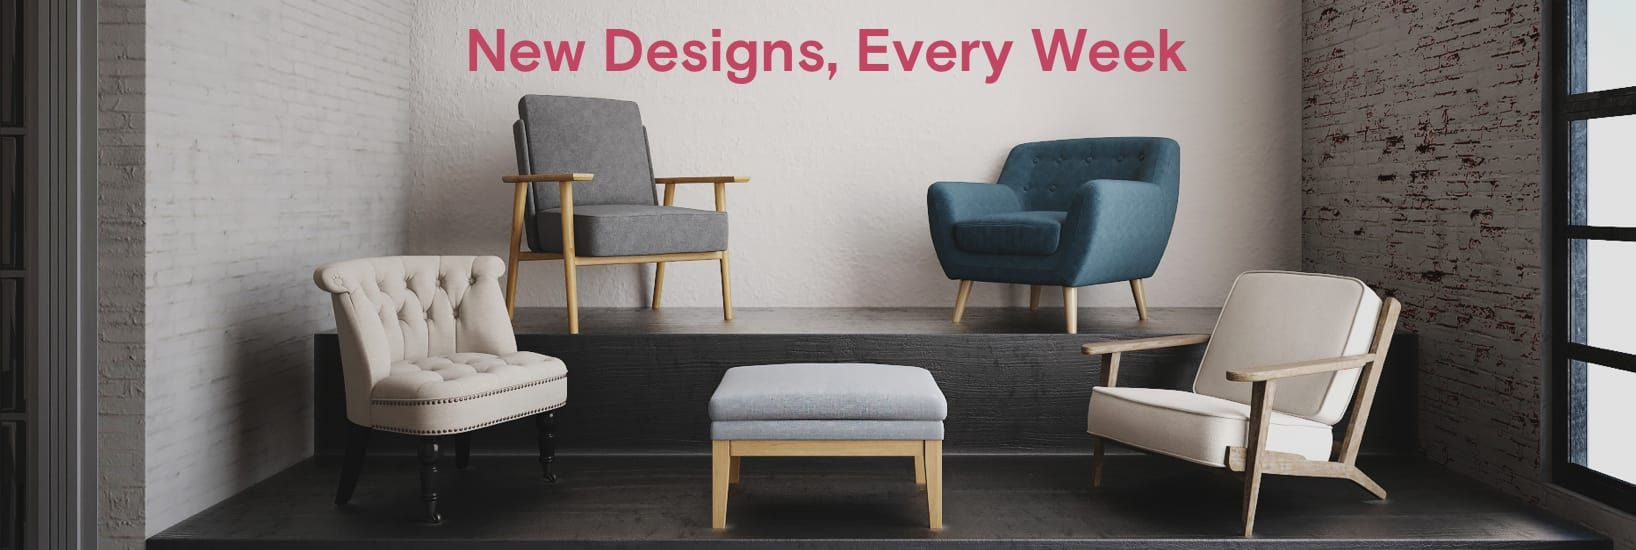 new designs copy top banner furniture in 2019 furniture queen rh pinterest com